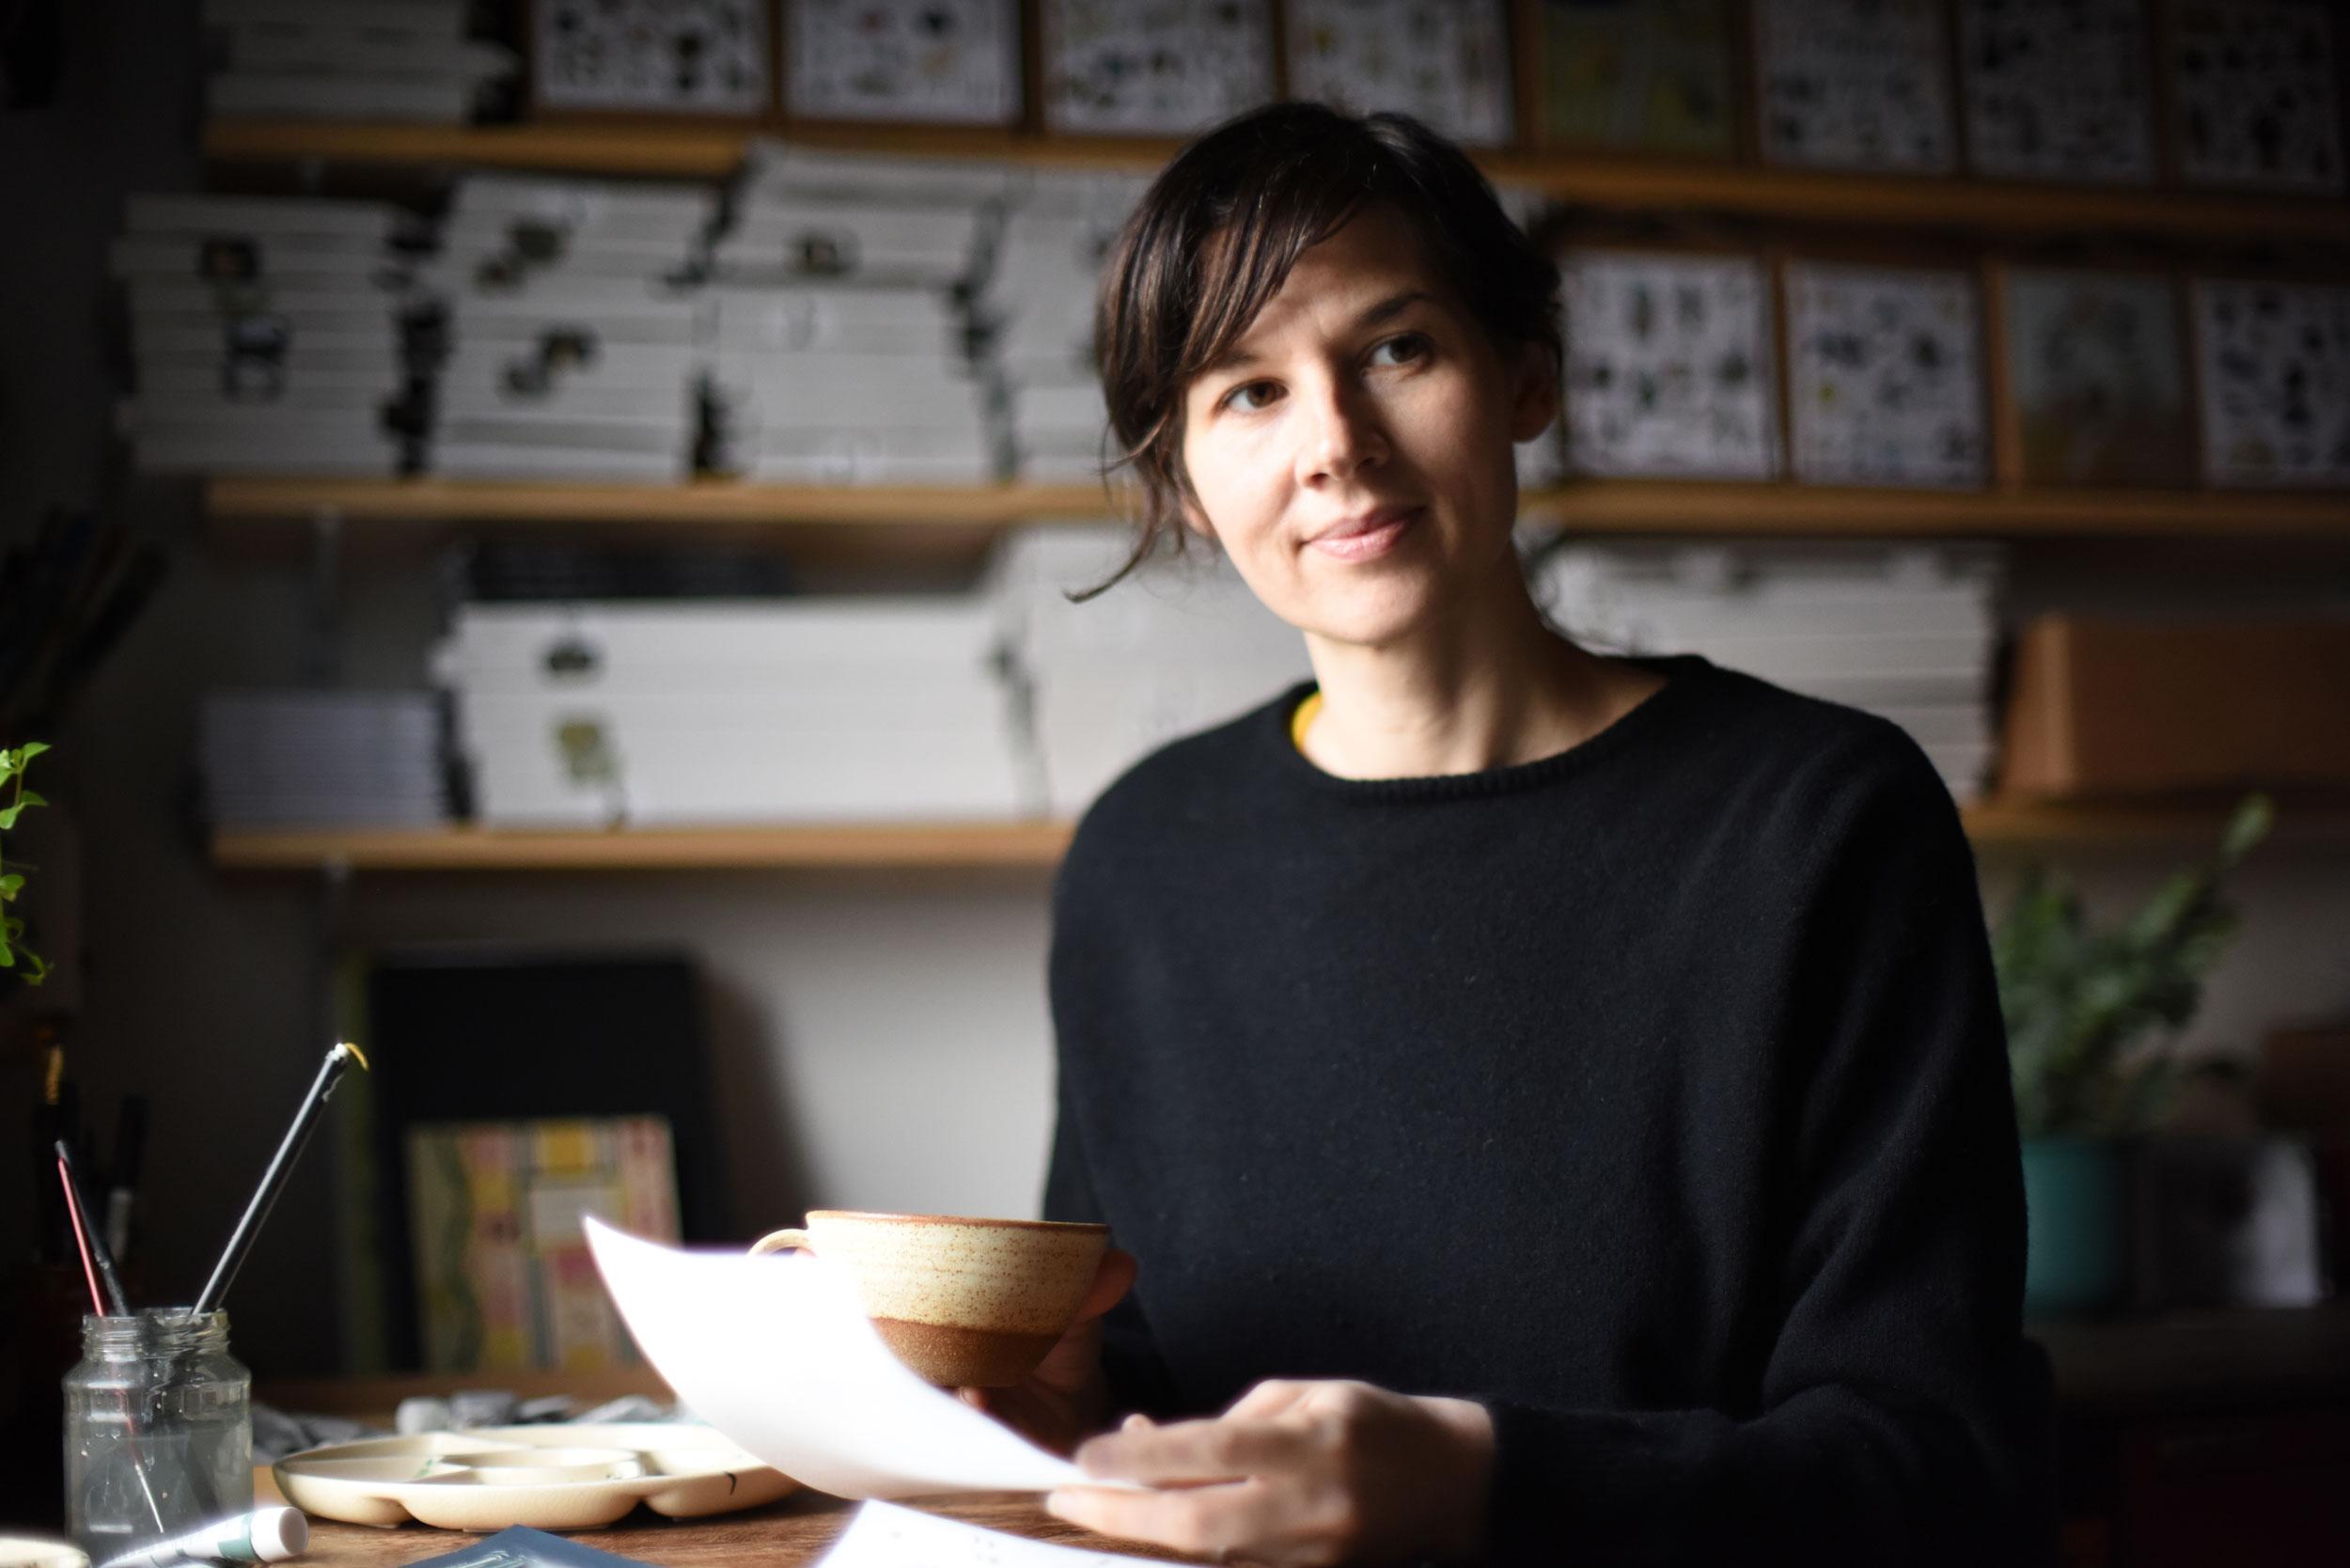 Gemma Koomen portret